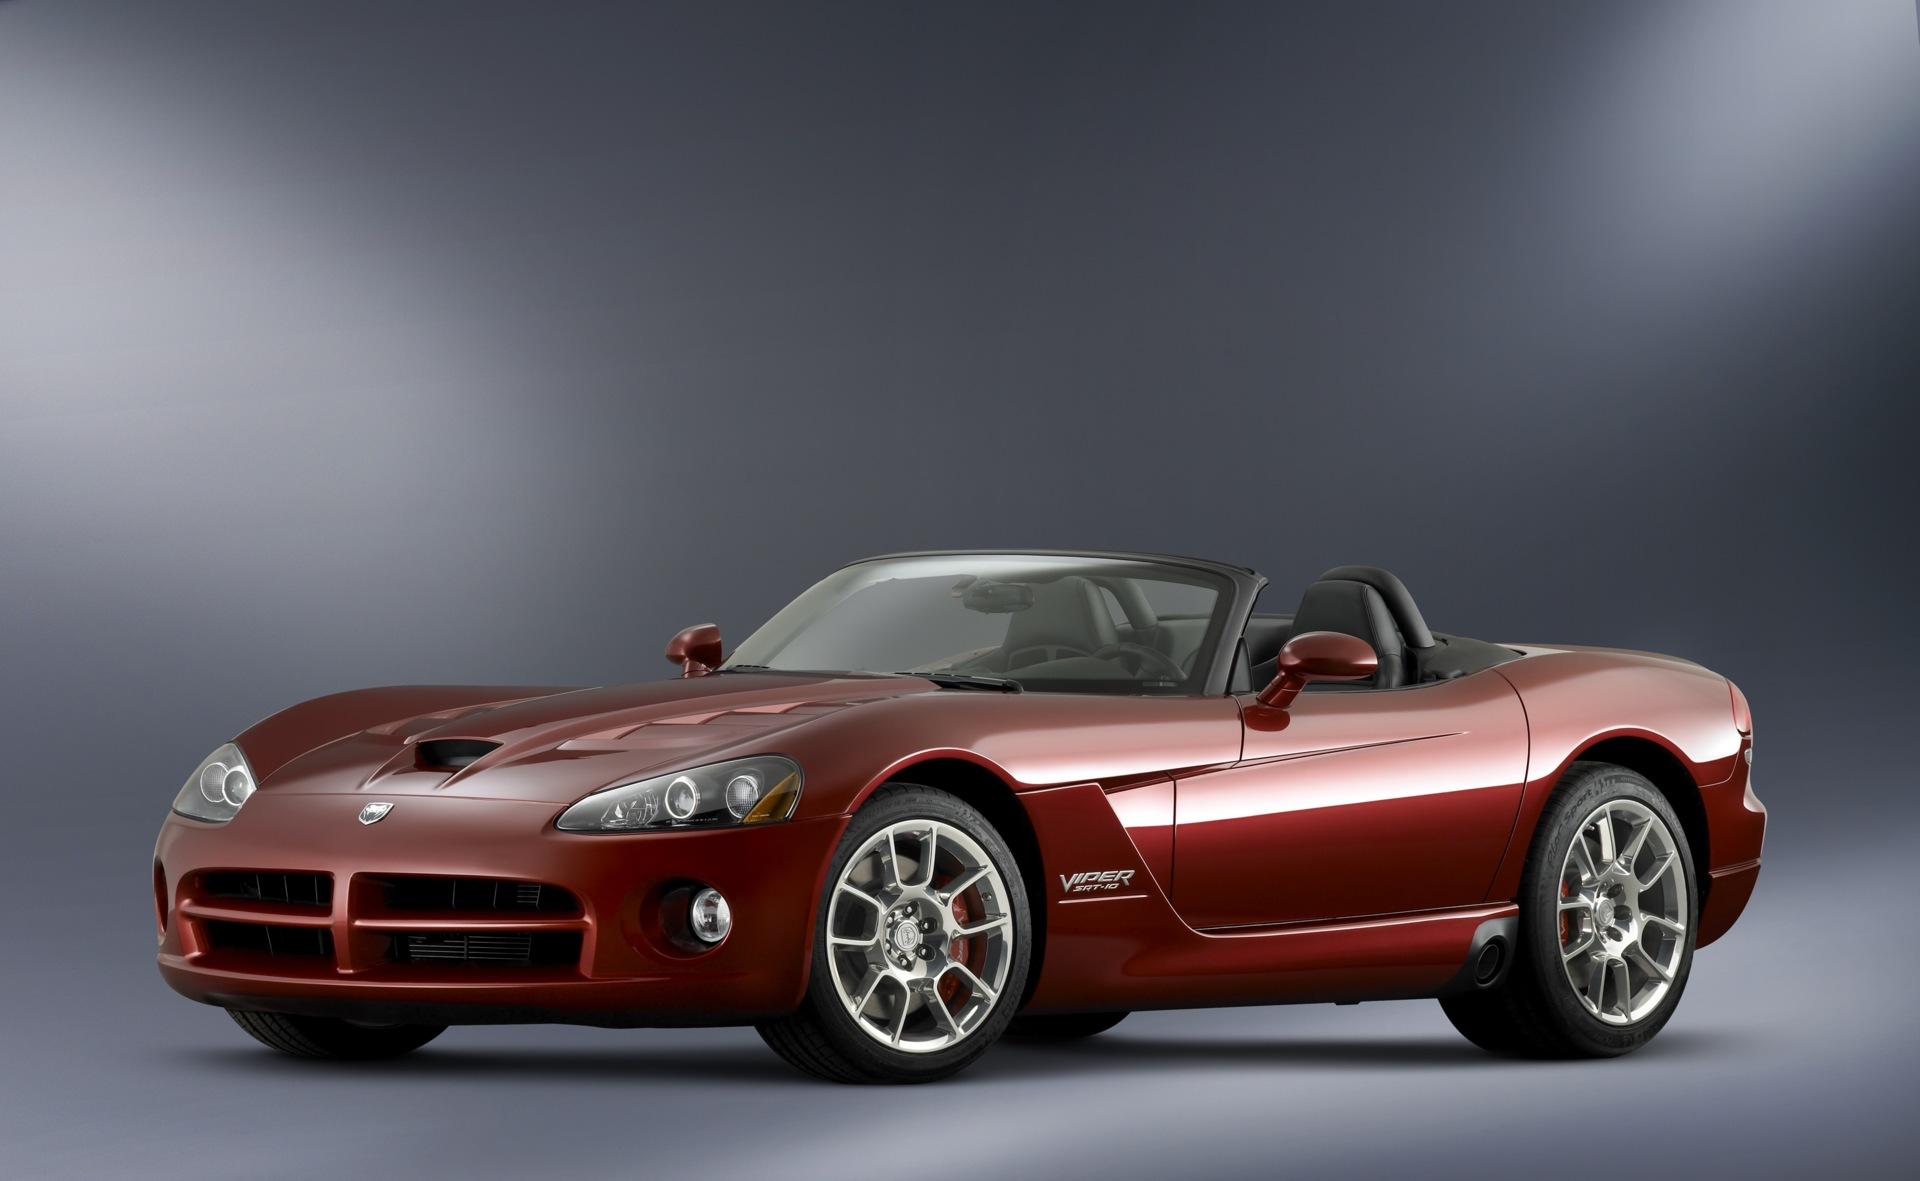 2008 Dodge Viper SRT10 News and Information